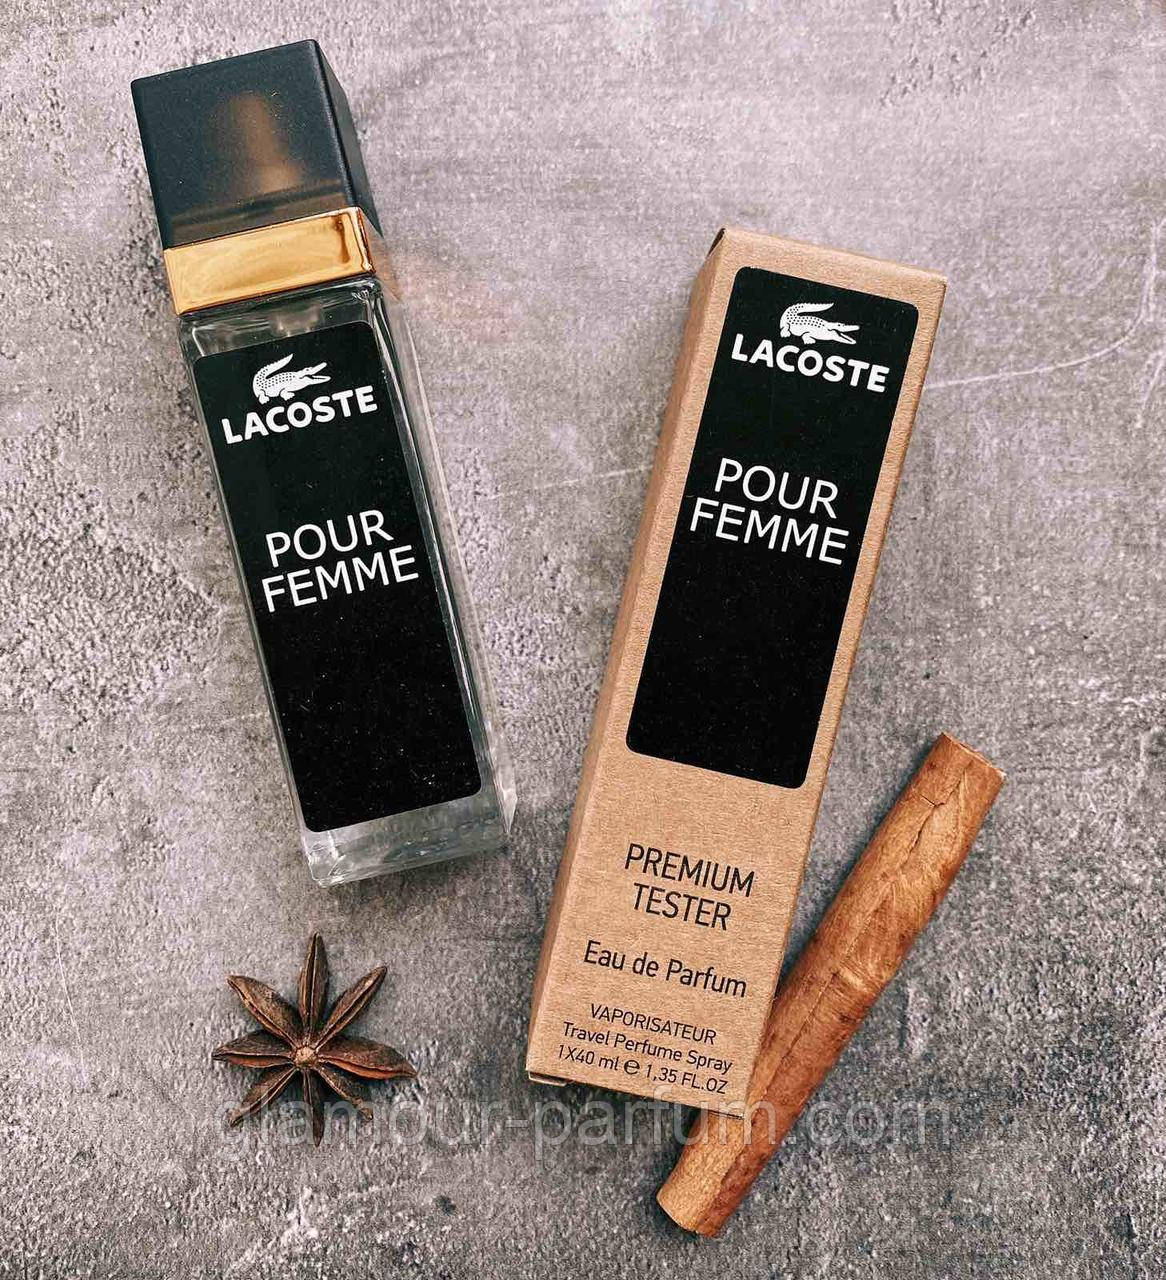 TESTER жіночий міні-парфуми Lacoste Pour Femme (Лакост Пур Фам) 40мл репліка ОПТ